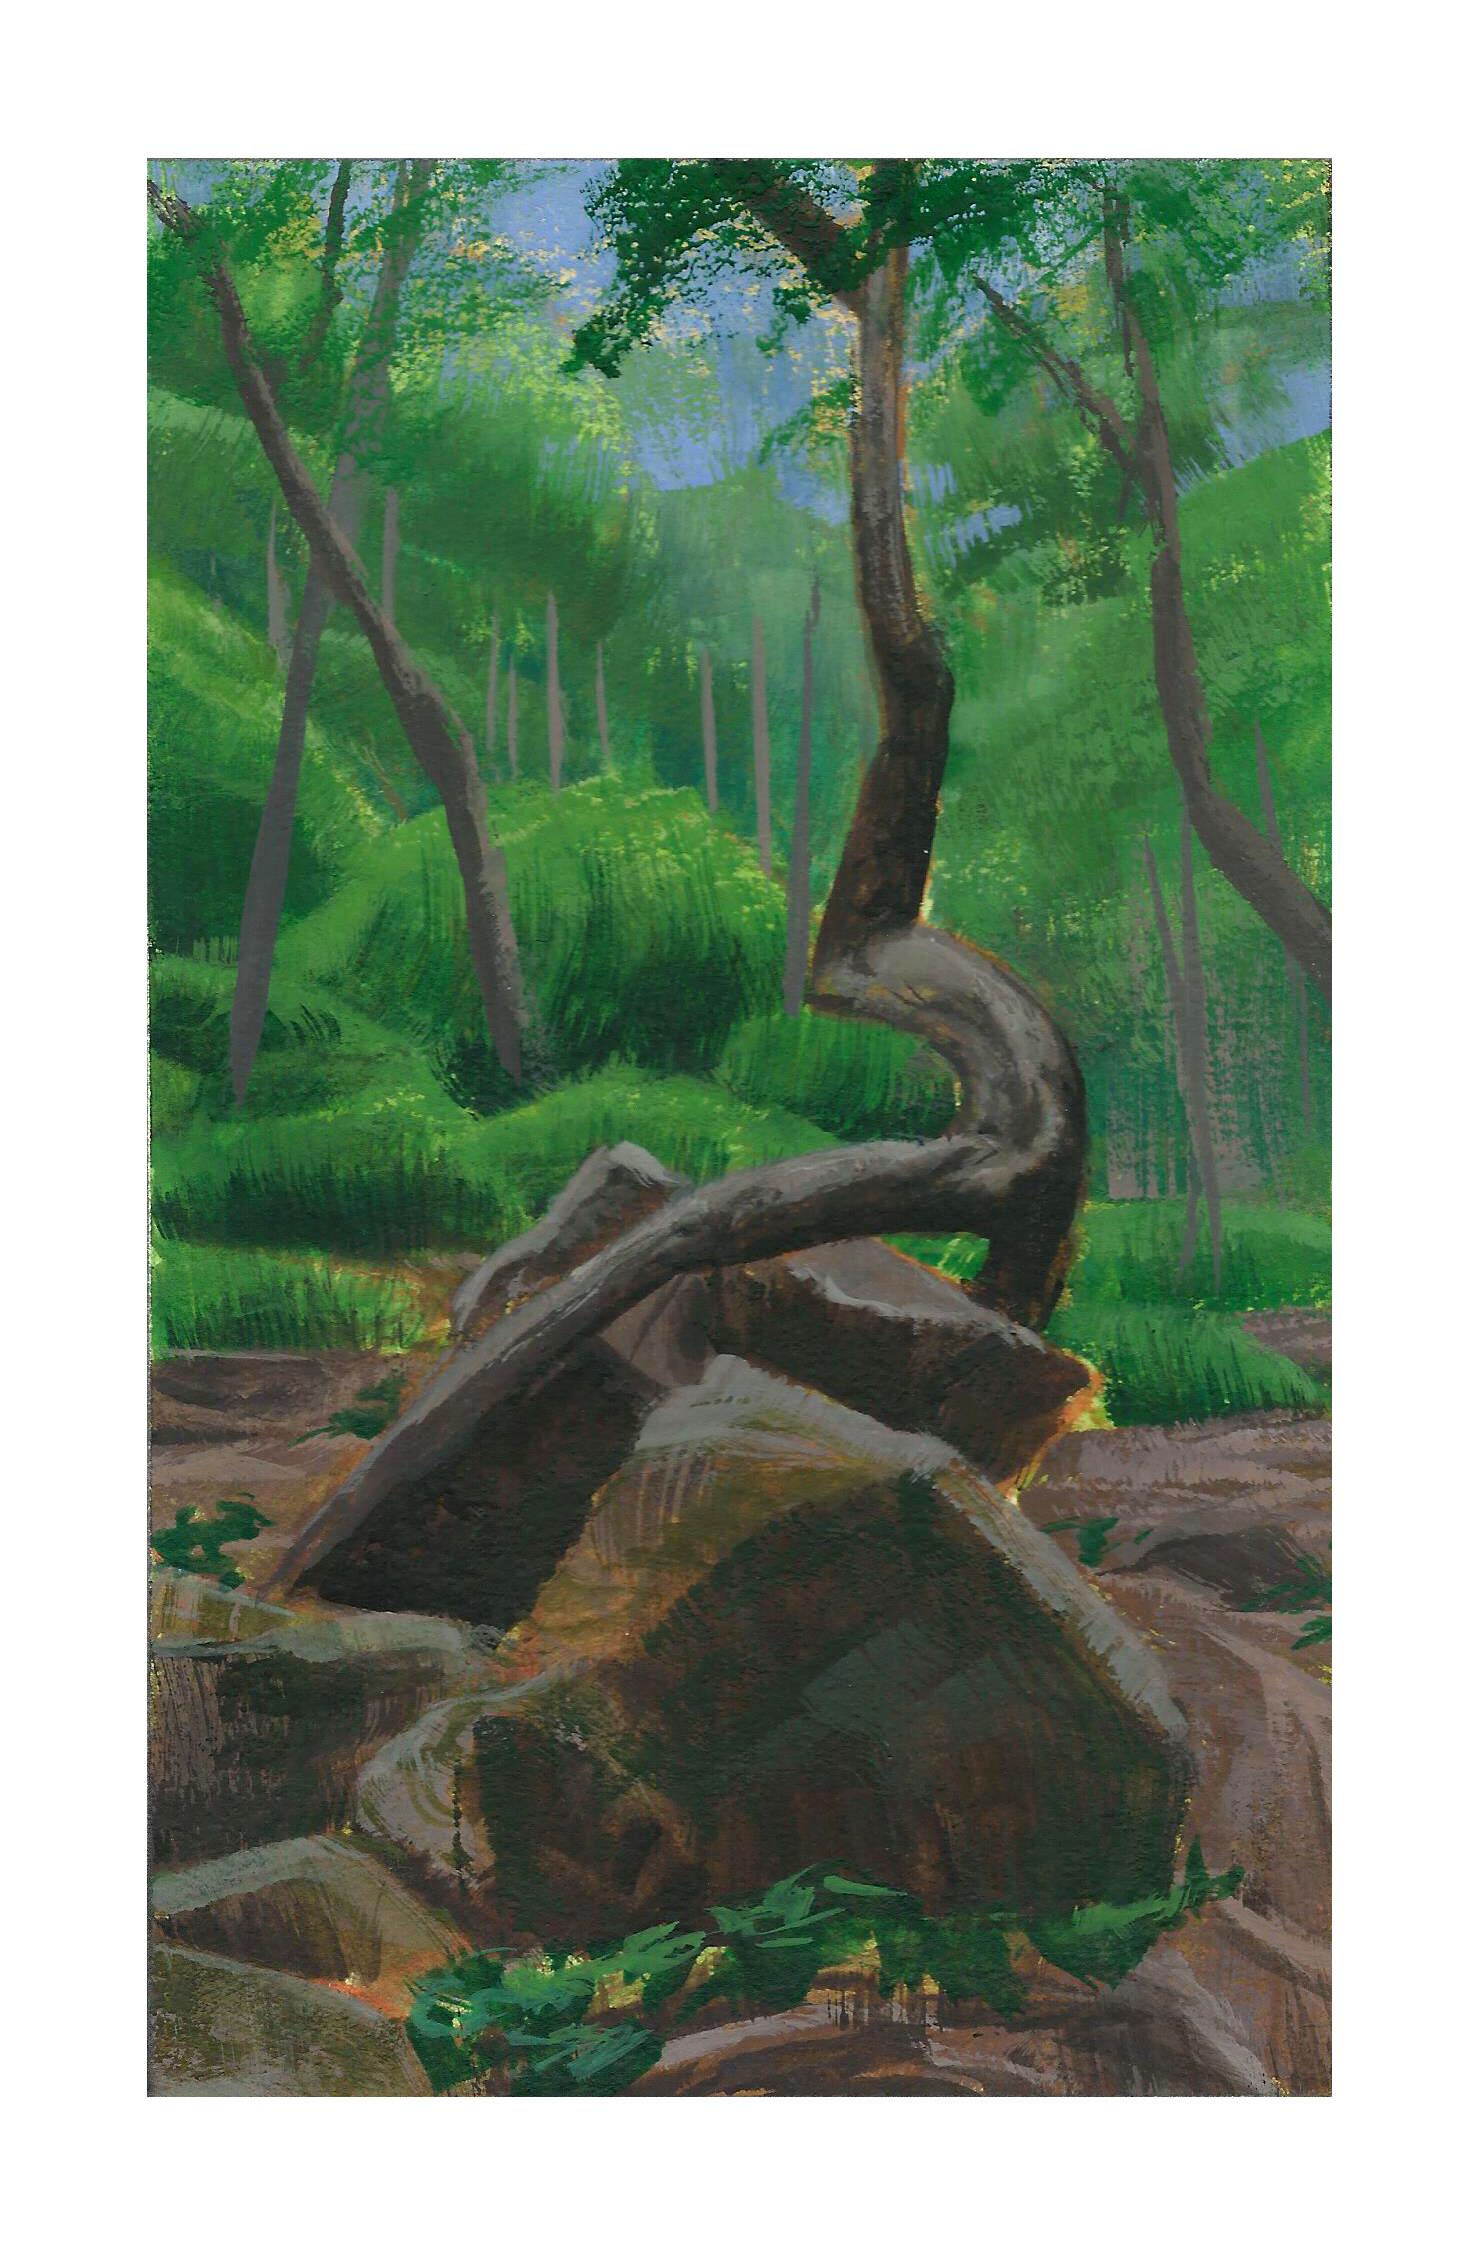 Paul yates landscapesketchingscan43 edit01